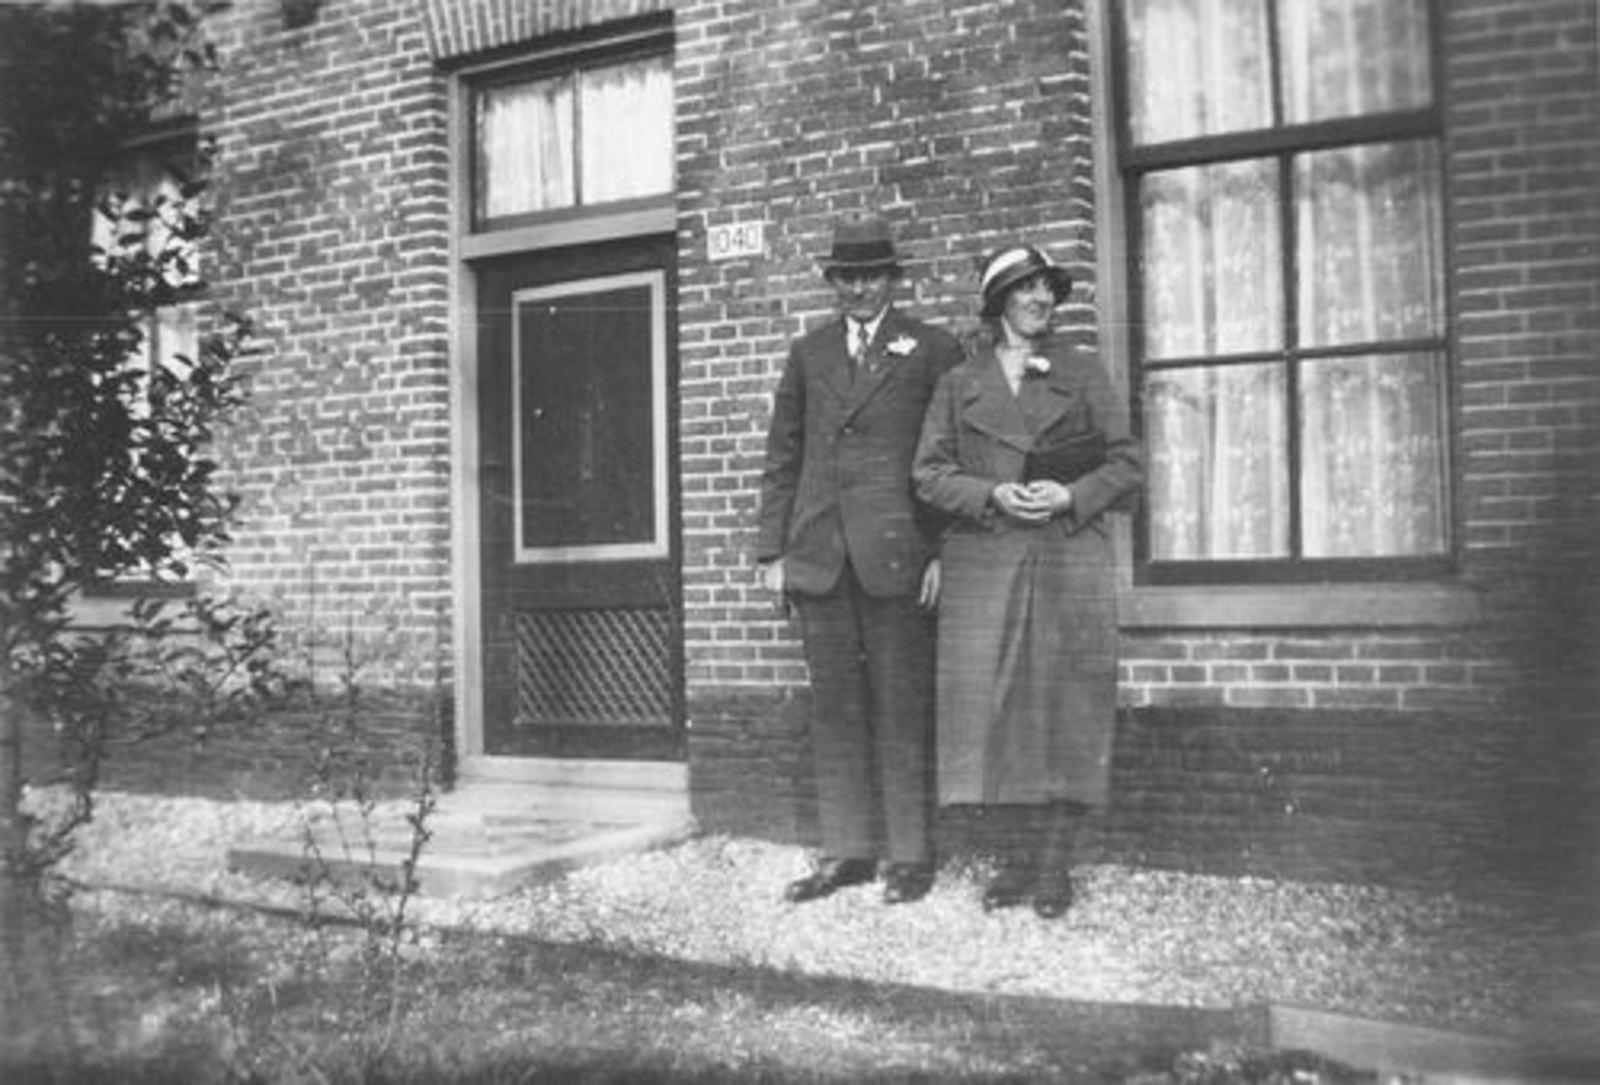 Hulst Adrianus A 1940 trouwt Johanna G Koeckhoven 01